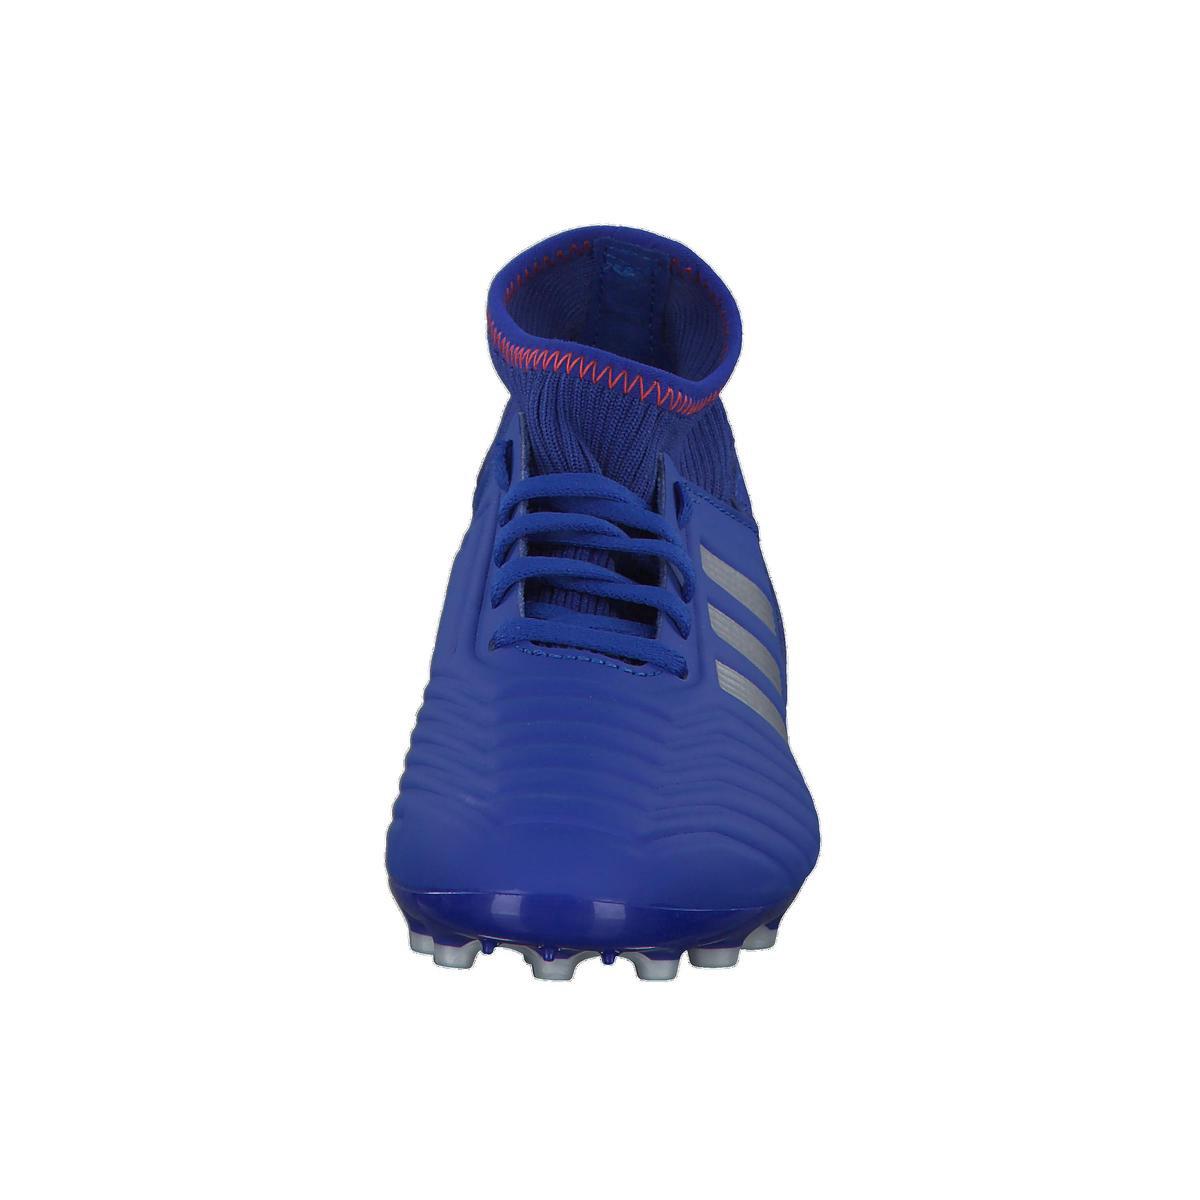 Adidas Performance Predator 19.3 AG Predator 19.3 AG